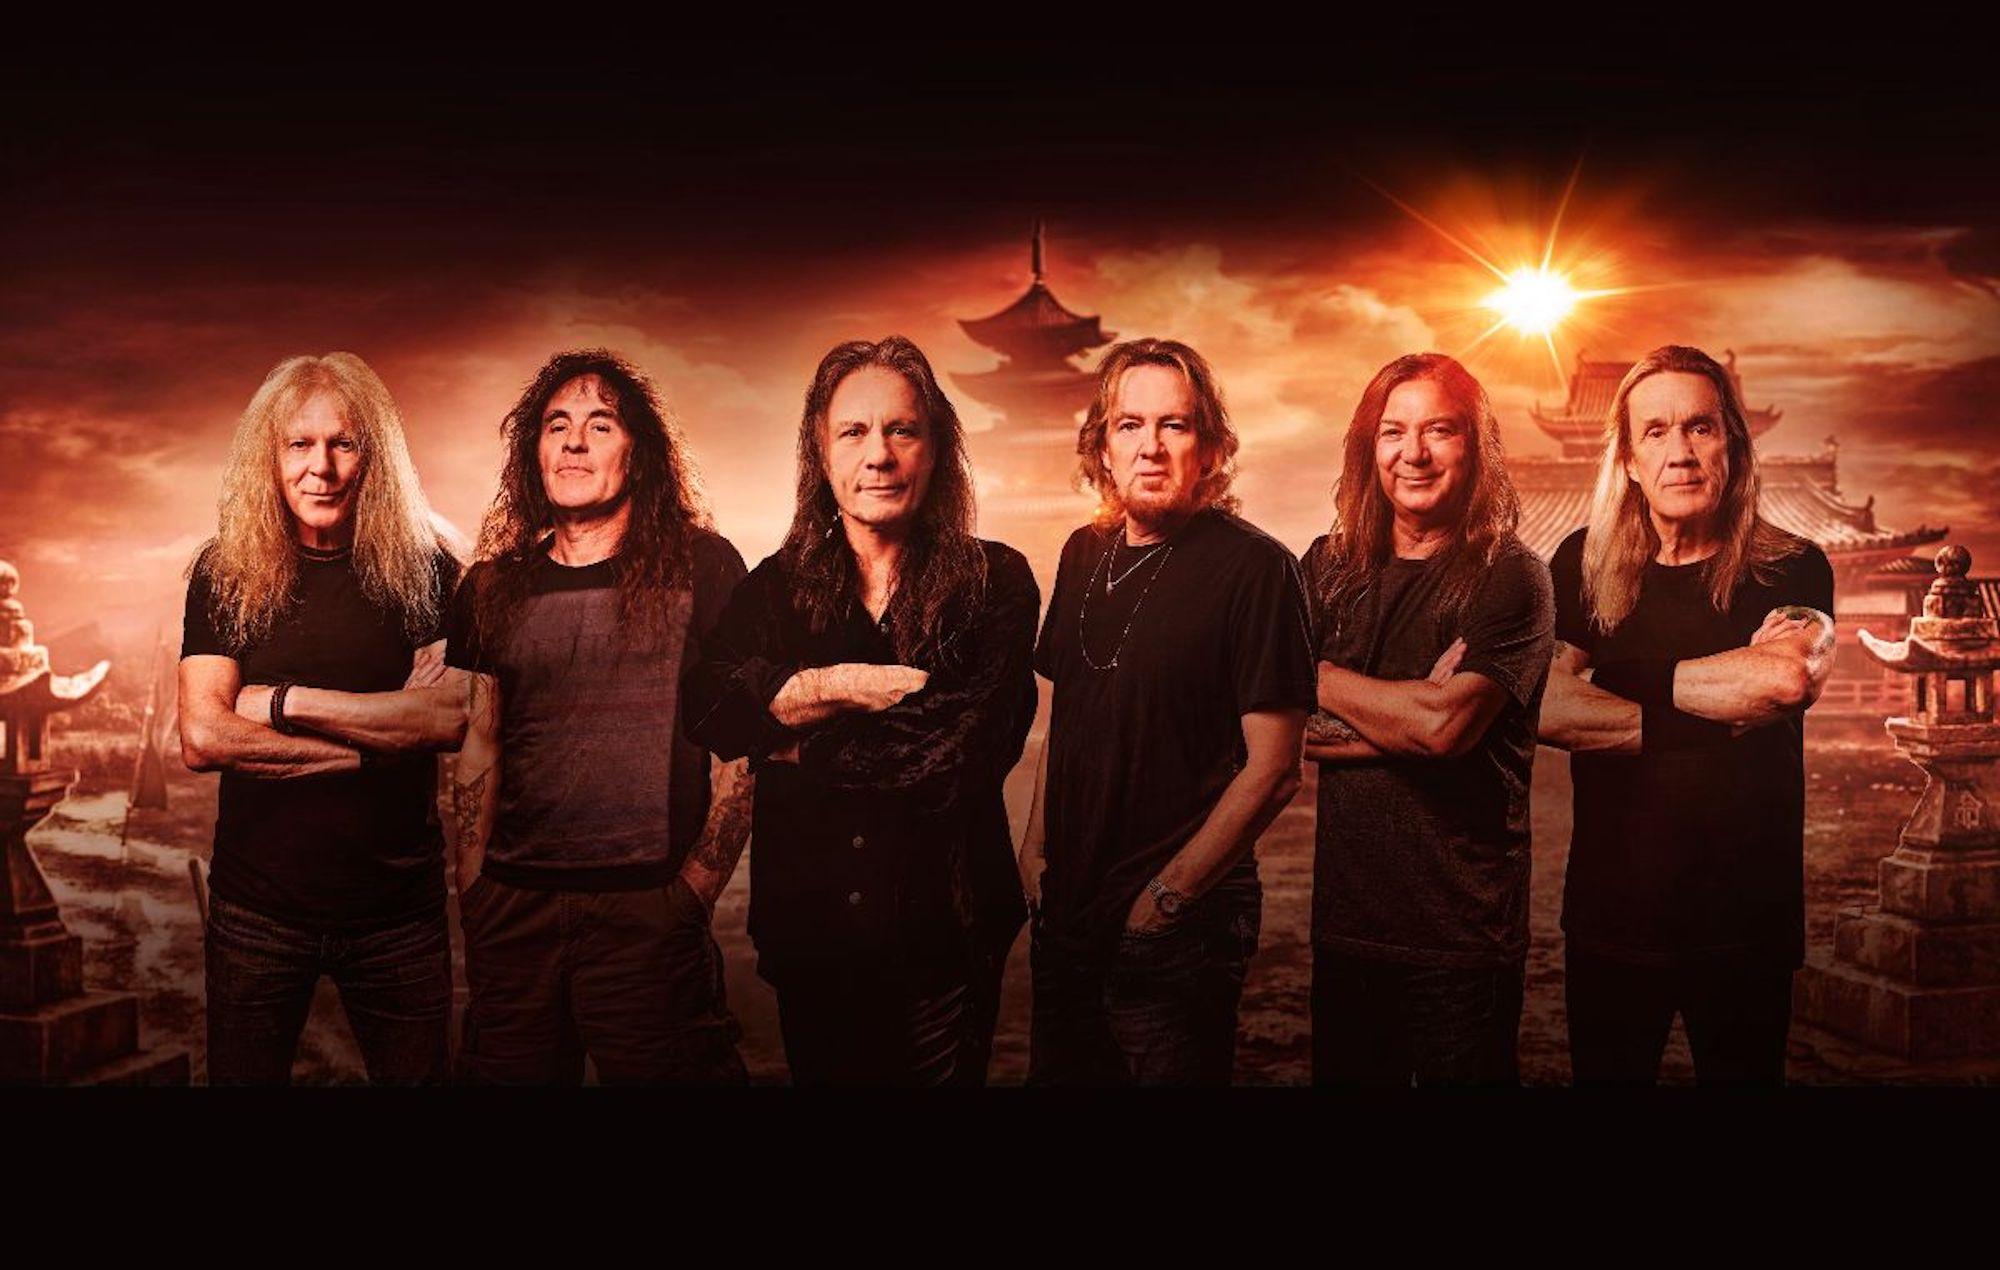 Iron Maiden band 2021 Music Trajectory